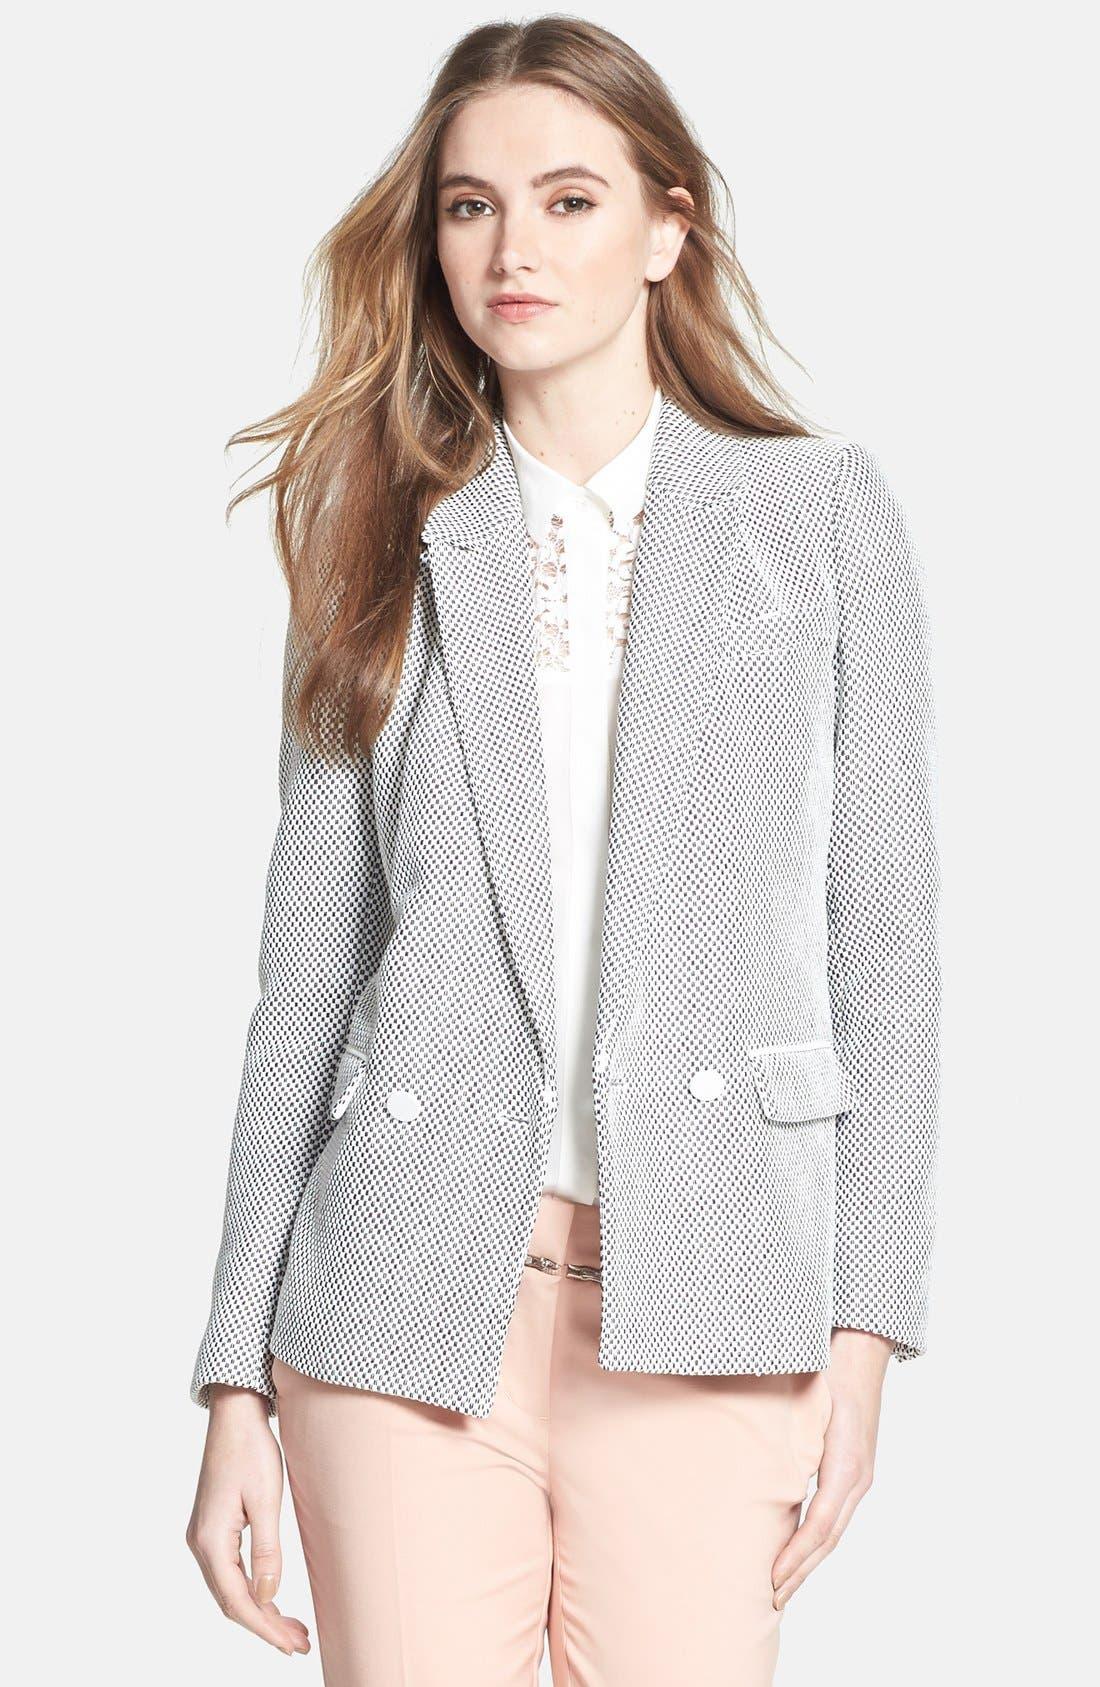 Alternate Image 1 Selected - Rebecca Taylor 'Honeycomb' Jacket